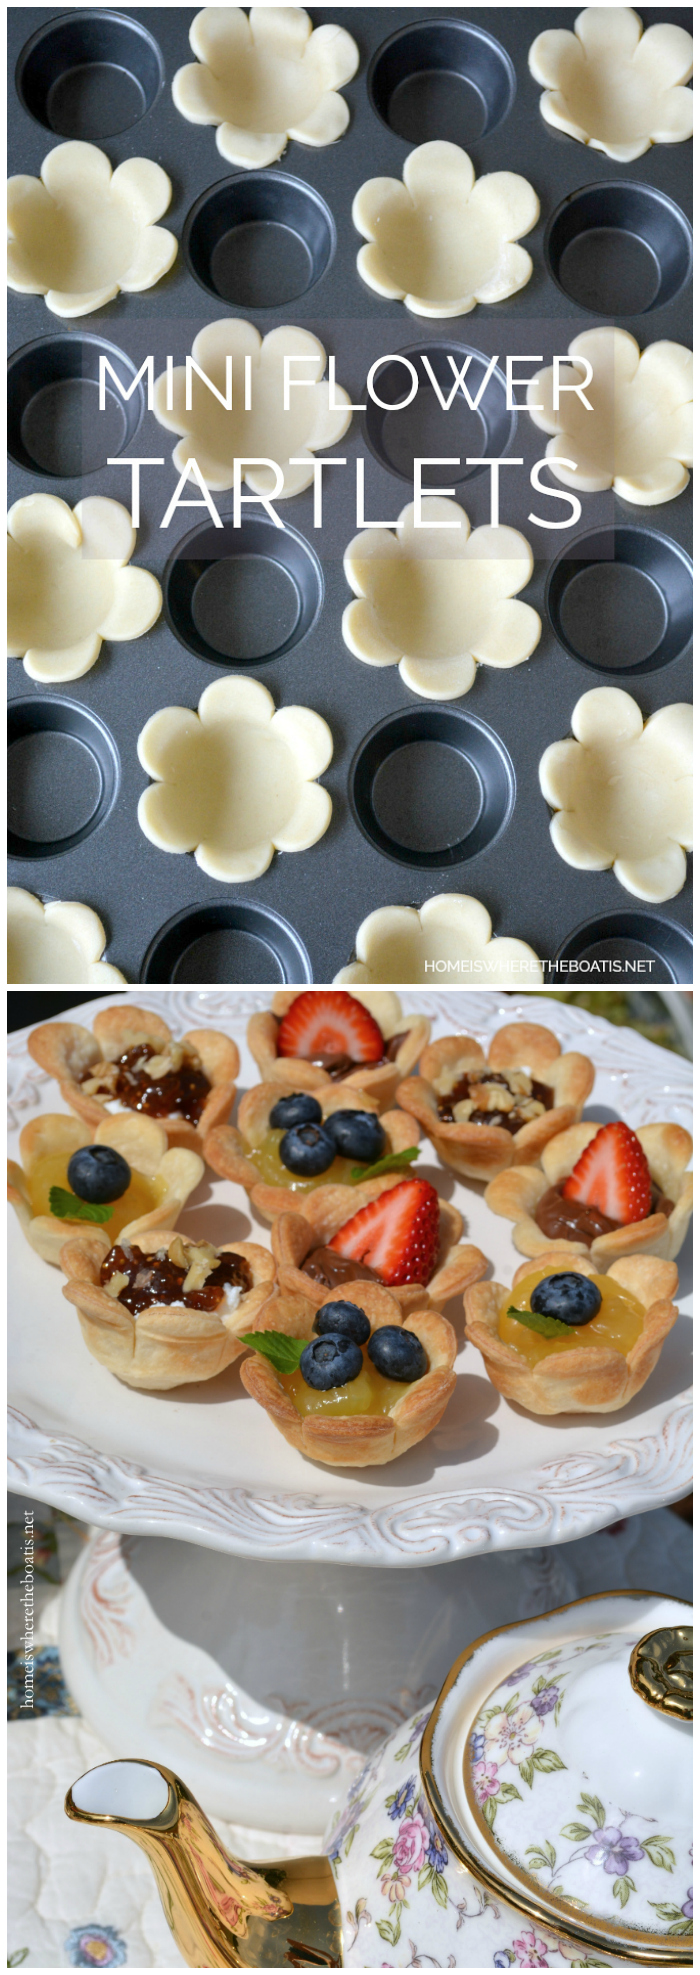 Mini Flower Tartlets   ©homeiswheretheboatis.net #teaparty #recipes